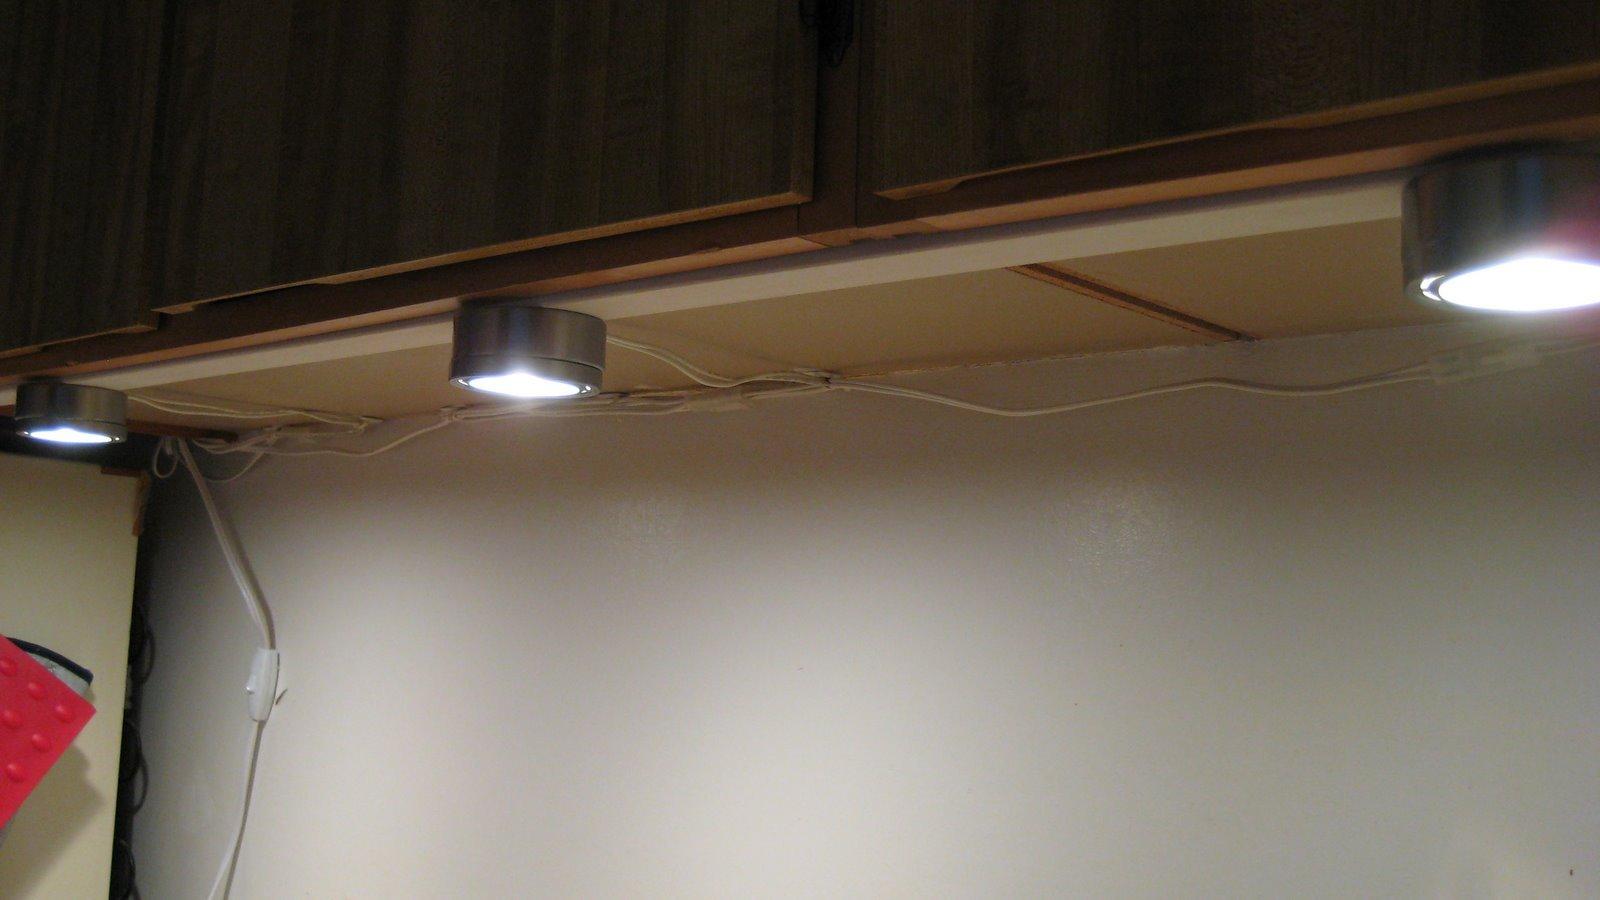 Ikea Grundtal Under Cabinet Lighting ~ Improve your kitchen counter lighting  IKEA Hackers  IKEA Hackers